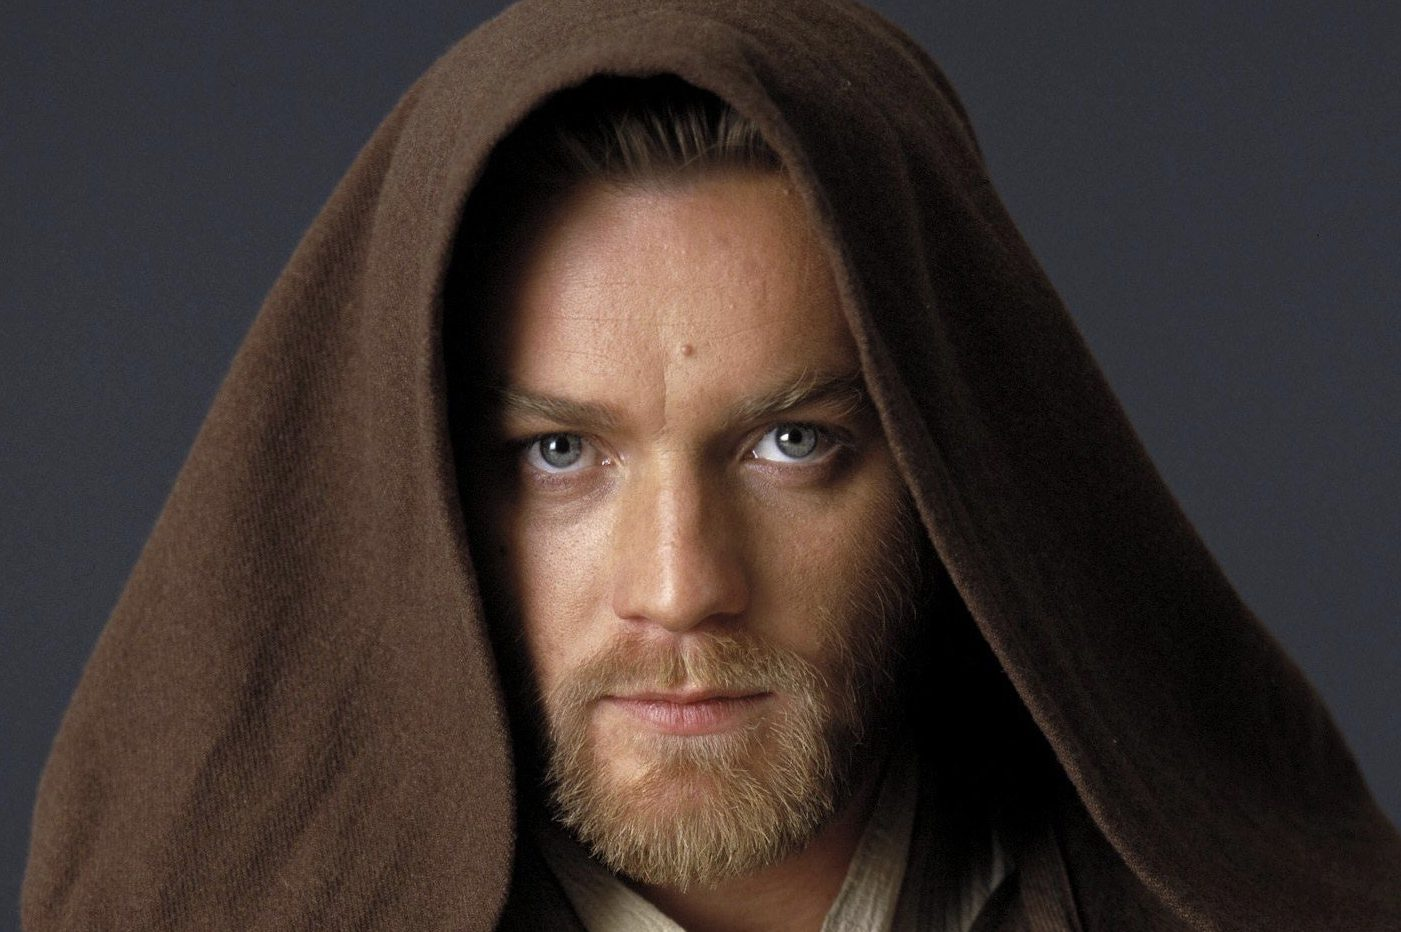 Disney : Bientôt un retour d'Obi-Wan-Kenobi ?